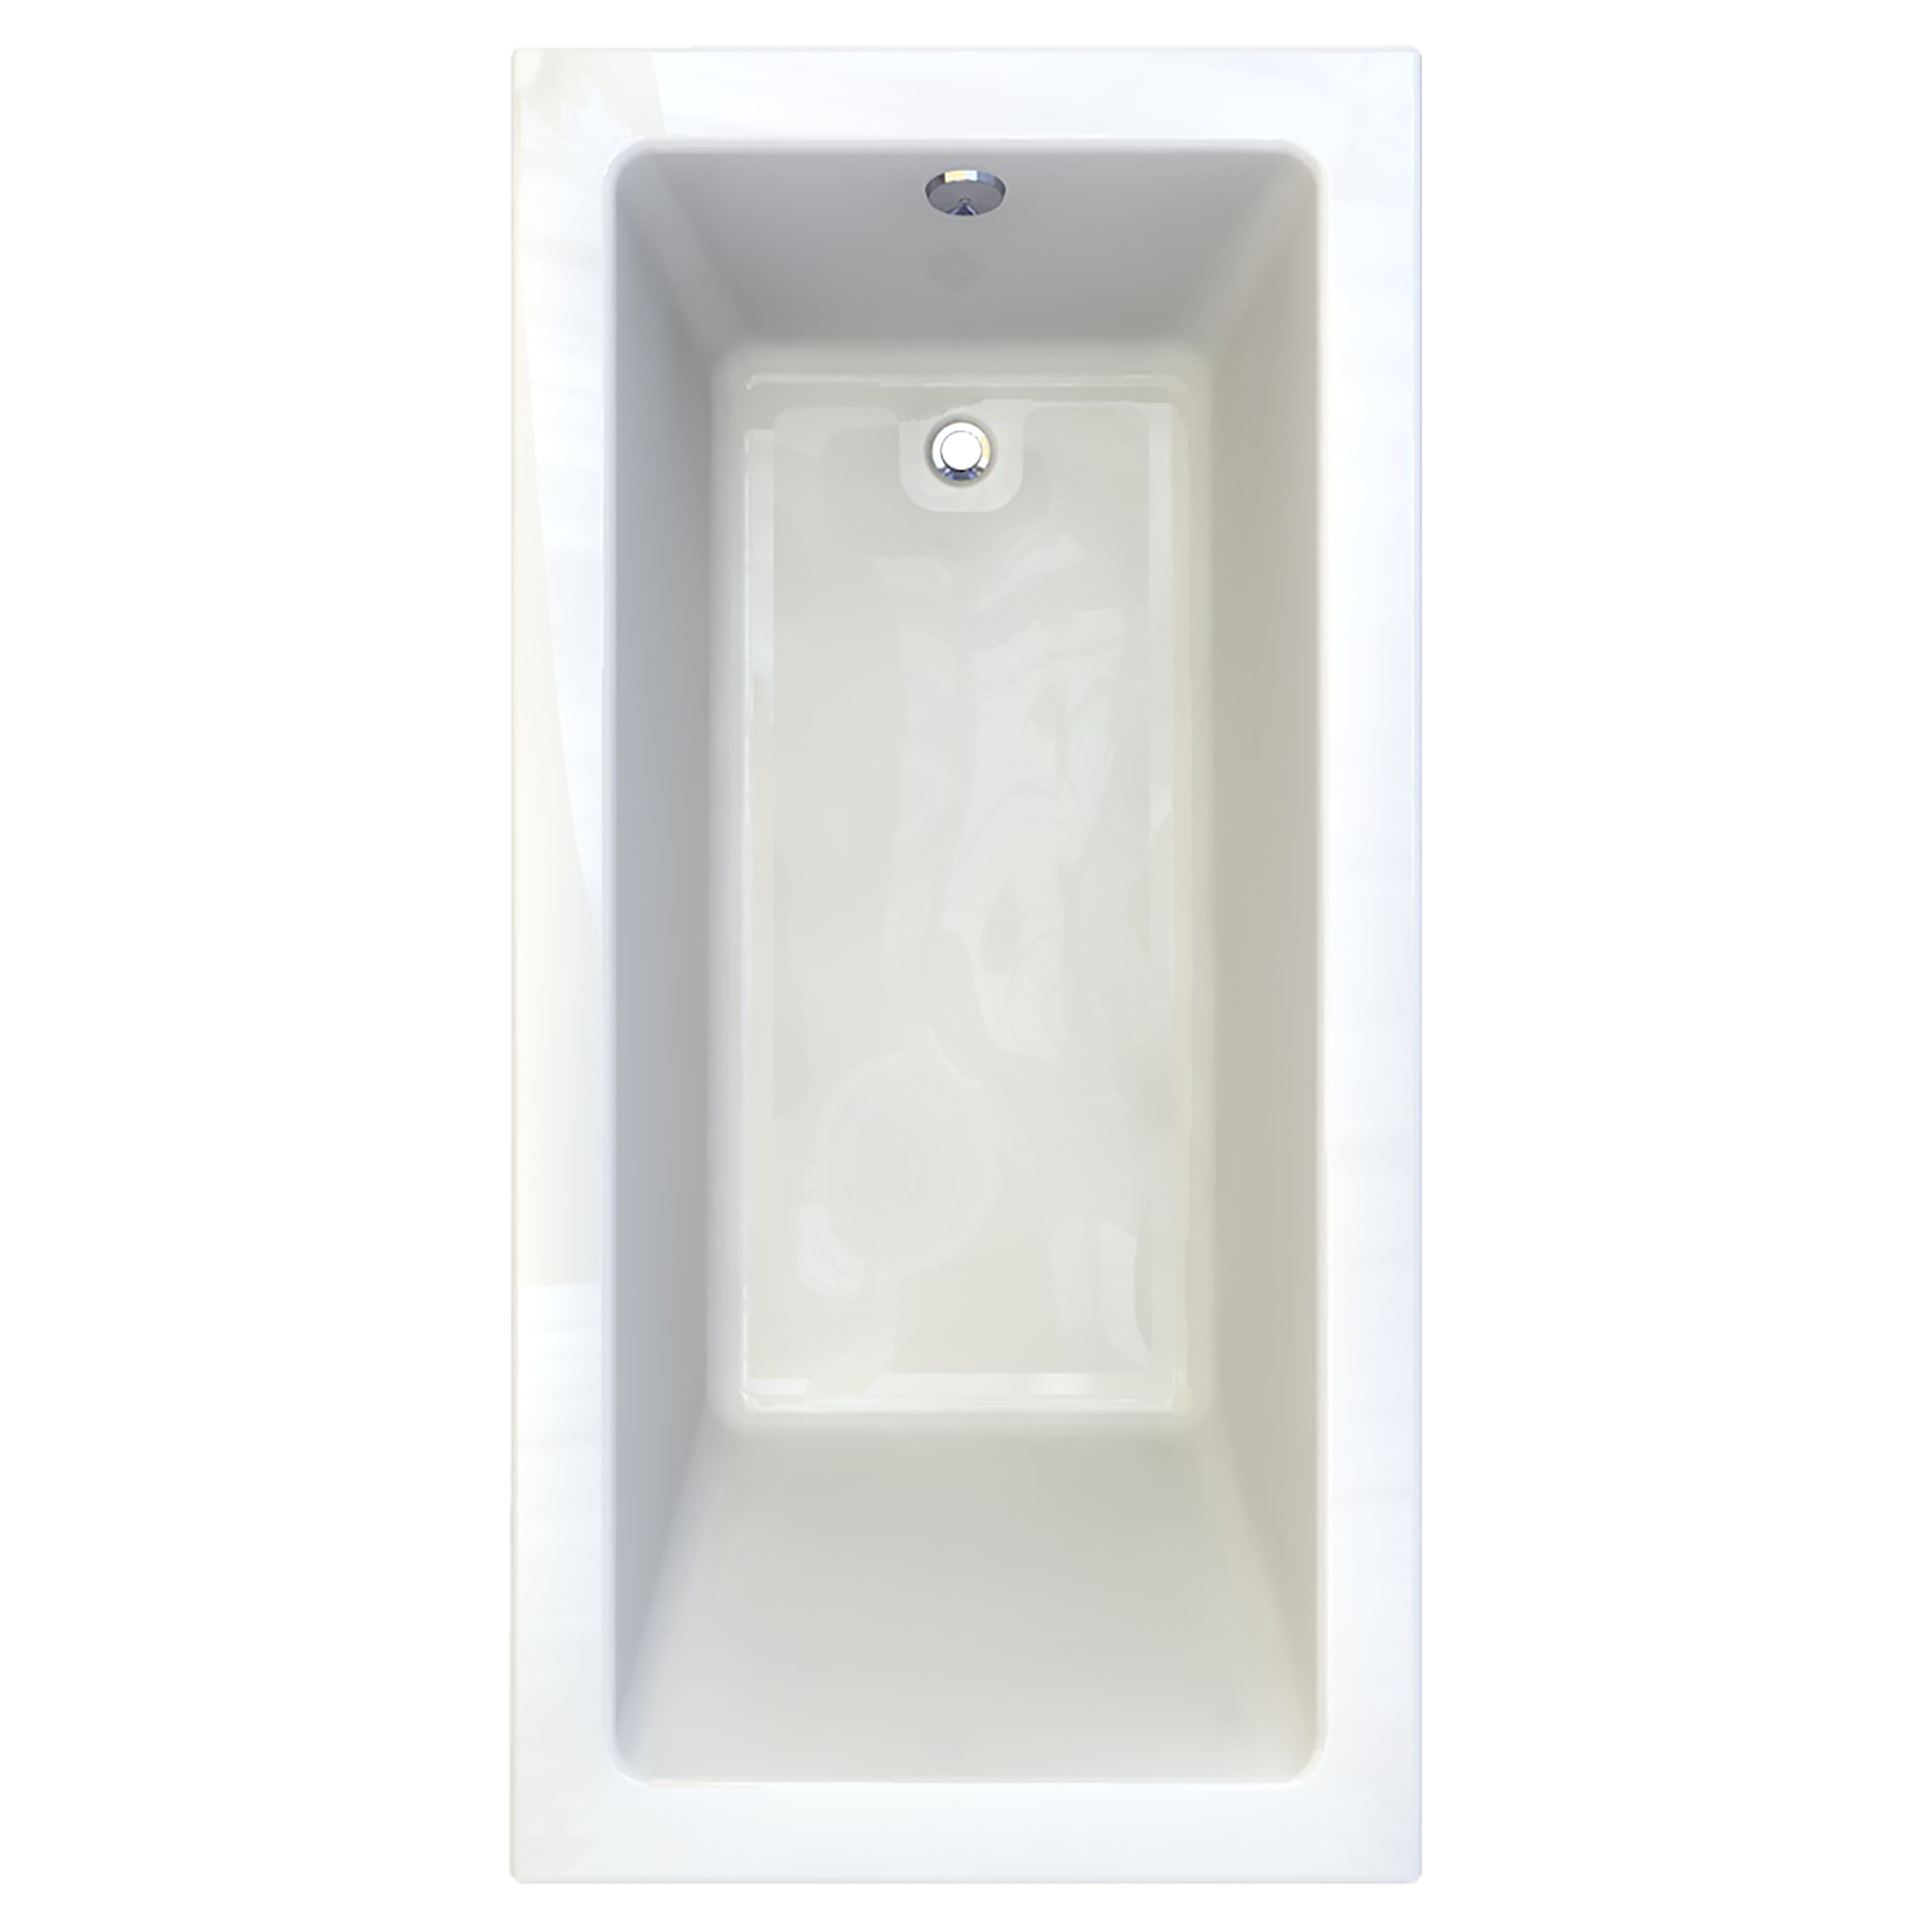 Pin by Harmony Gibbs on Bath lust | Pinterest | Bathtub, Minimalist ...